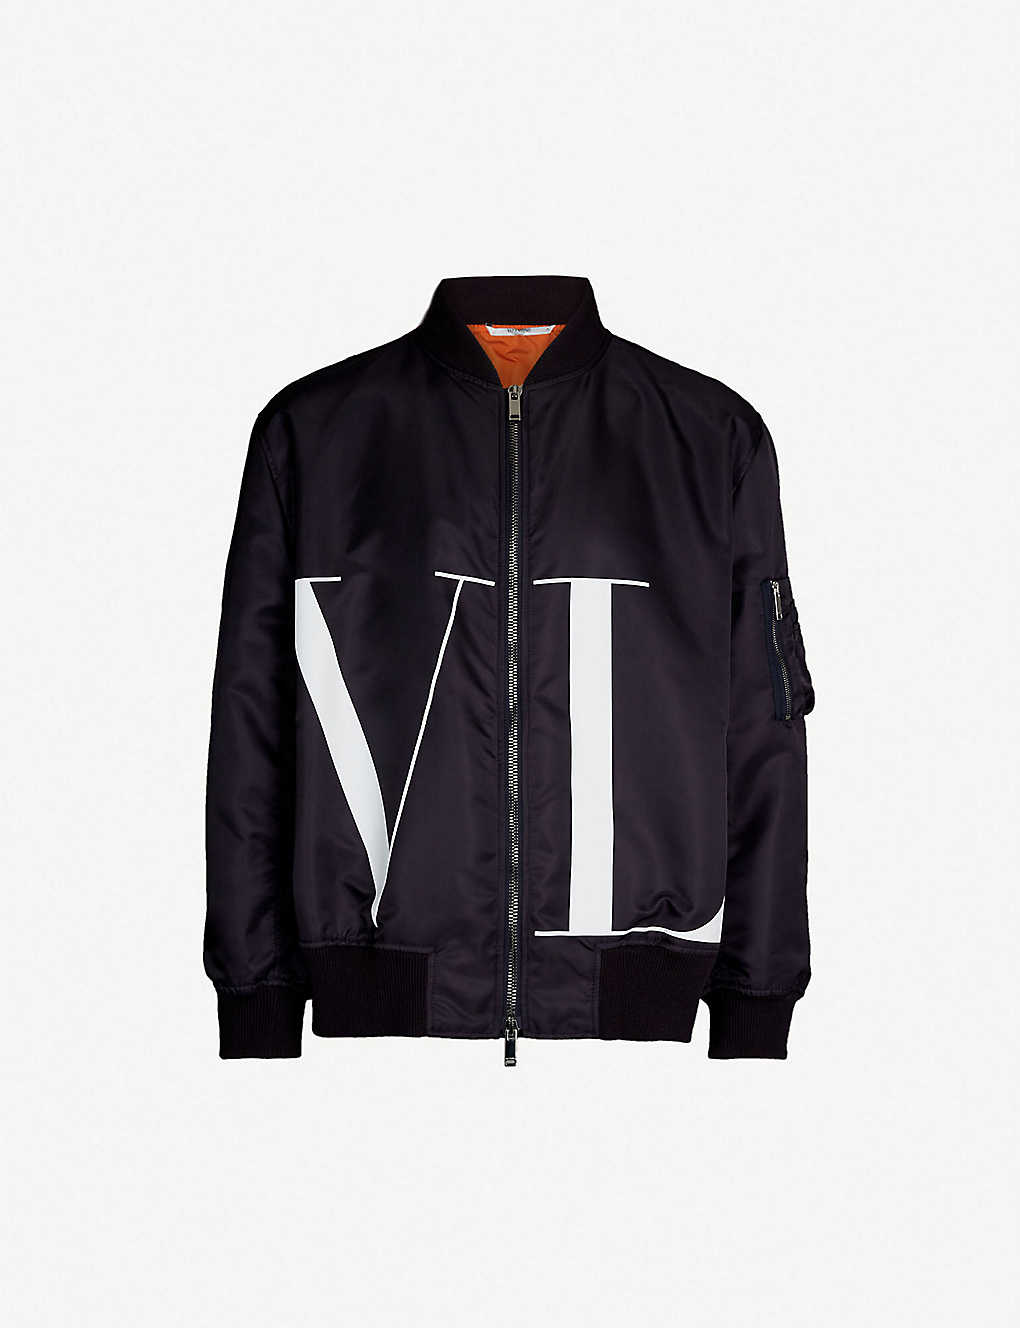 d72969417 VALENTINO - VLTN-print bomber jacket | Selfridges.com